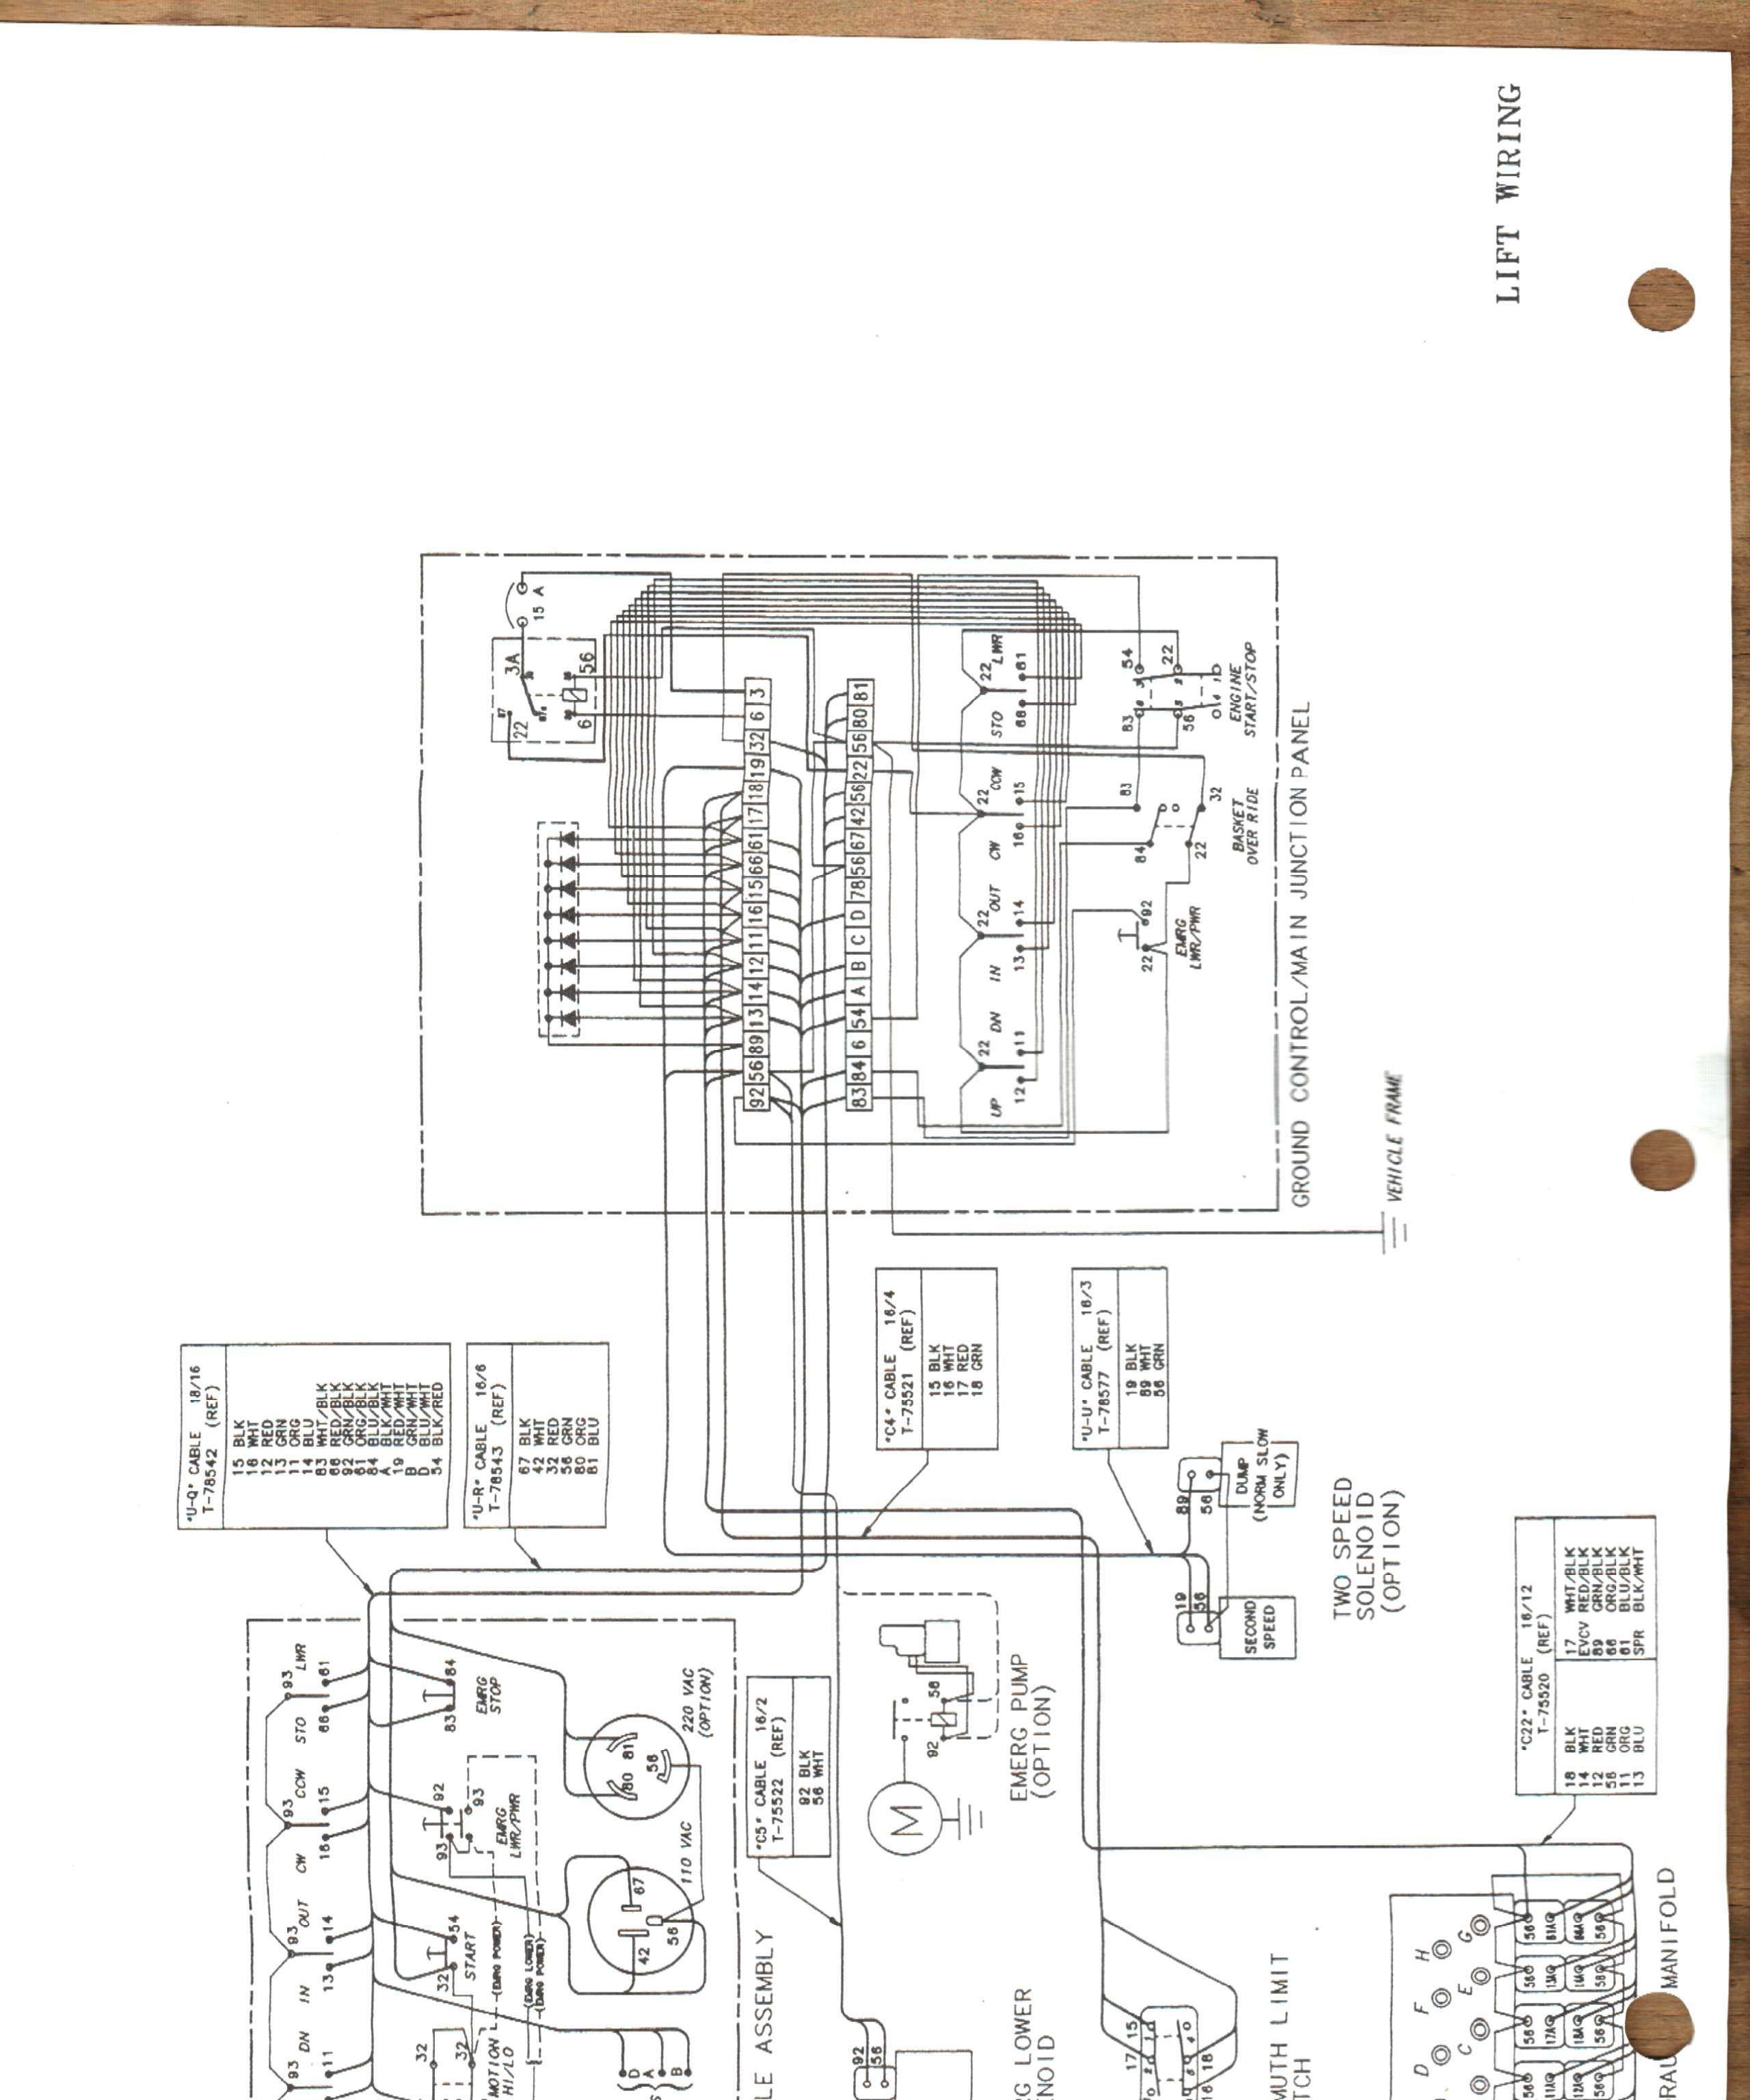 wiring diagram cars trucks wiring diagram cars trucks truck horn wiring wiring diagrams [ 2560 x 3072 Pixel ]